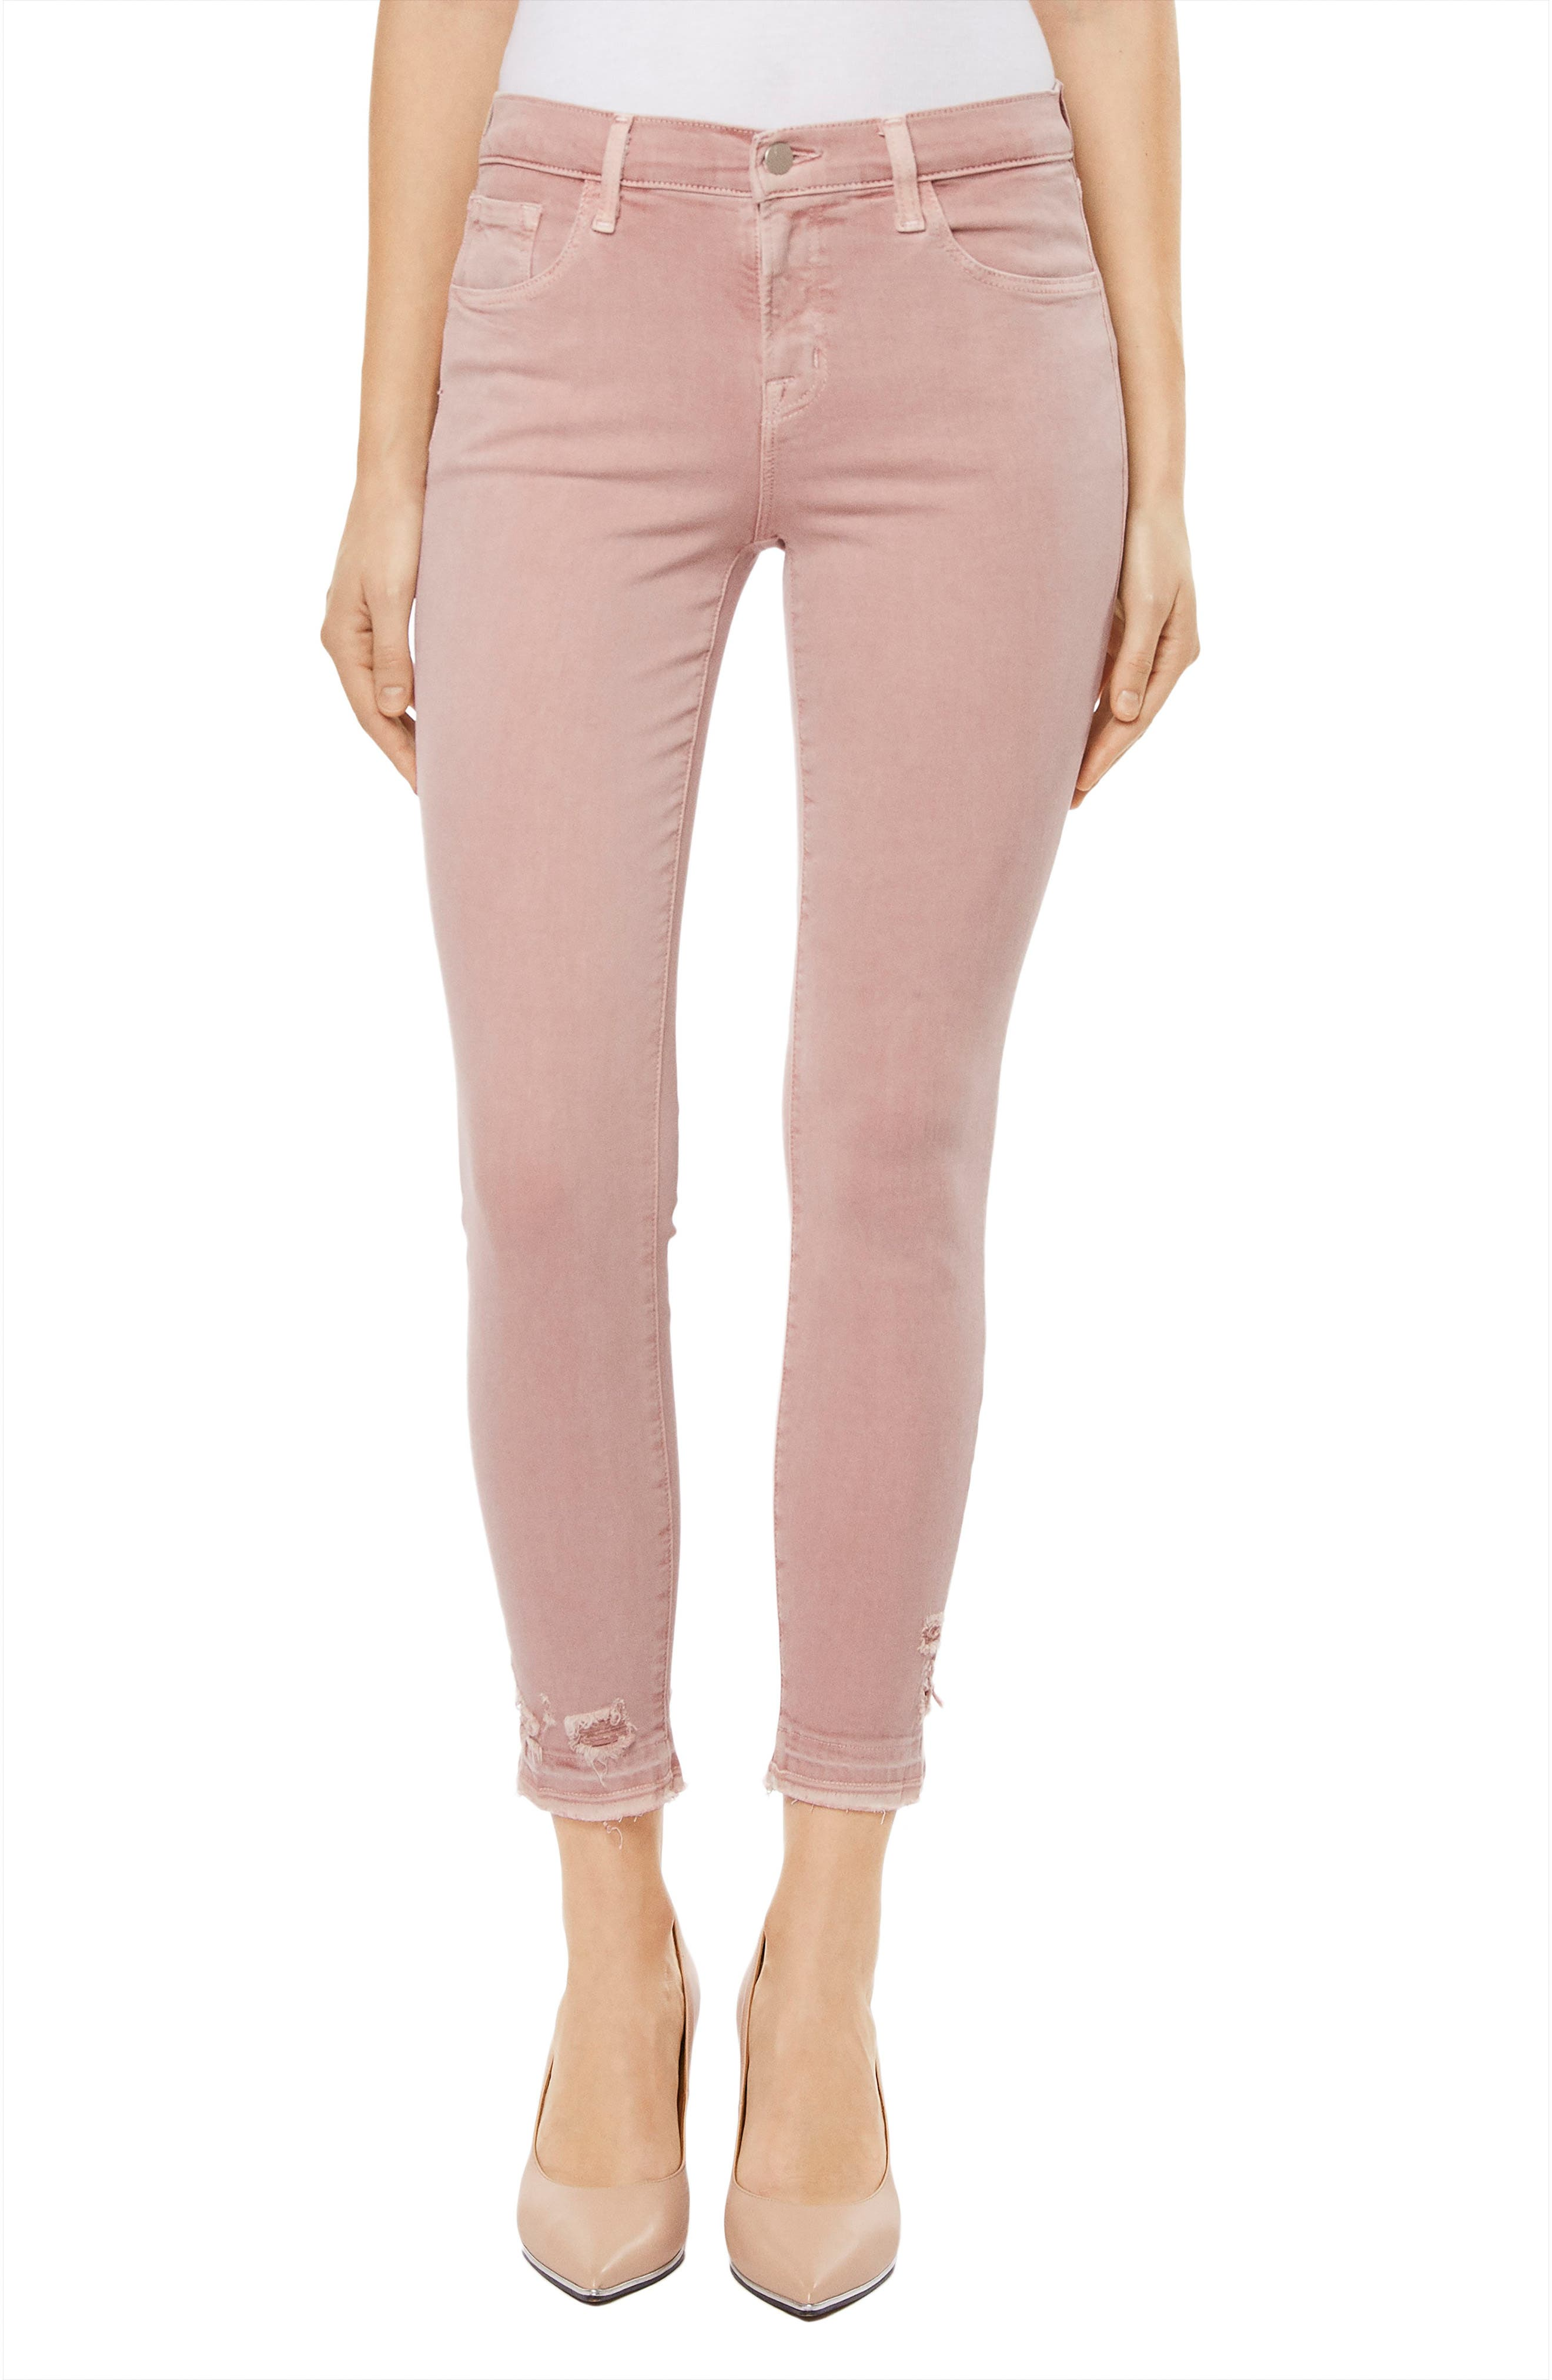 835 Capri Skinny Jeans,                         Main,                         color, Vinca Destruct